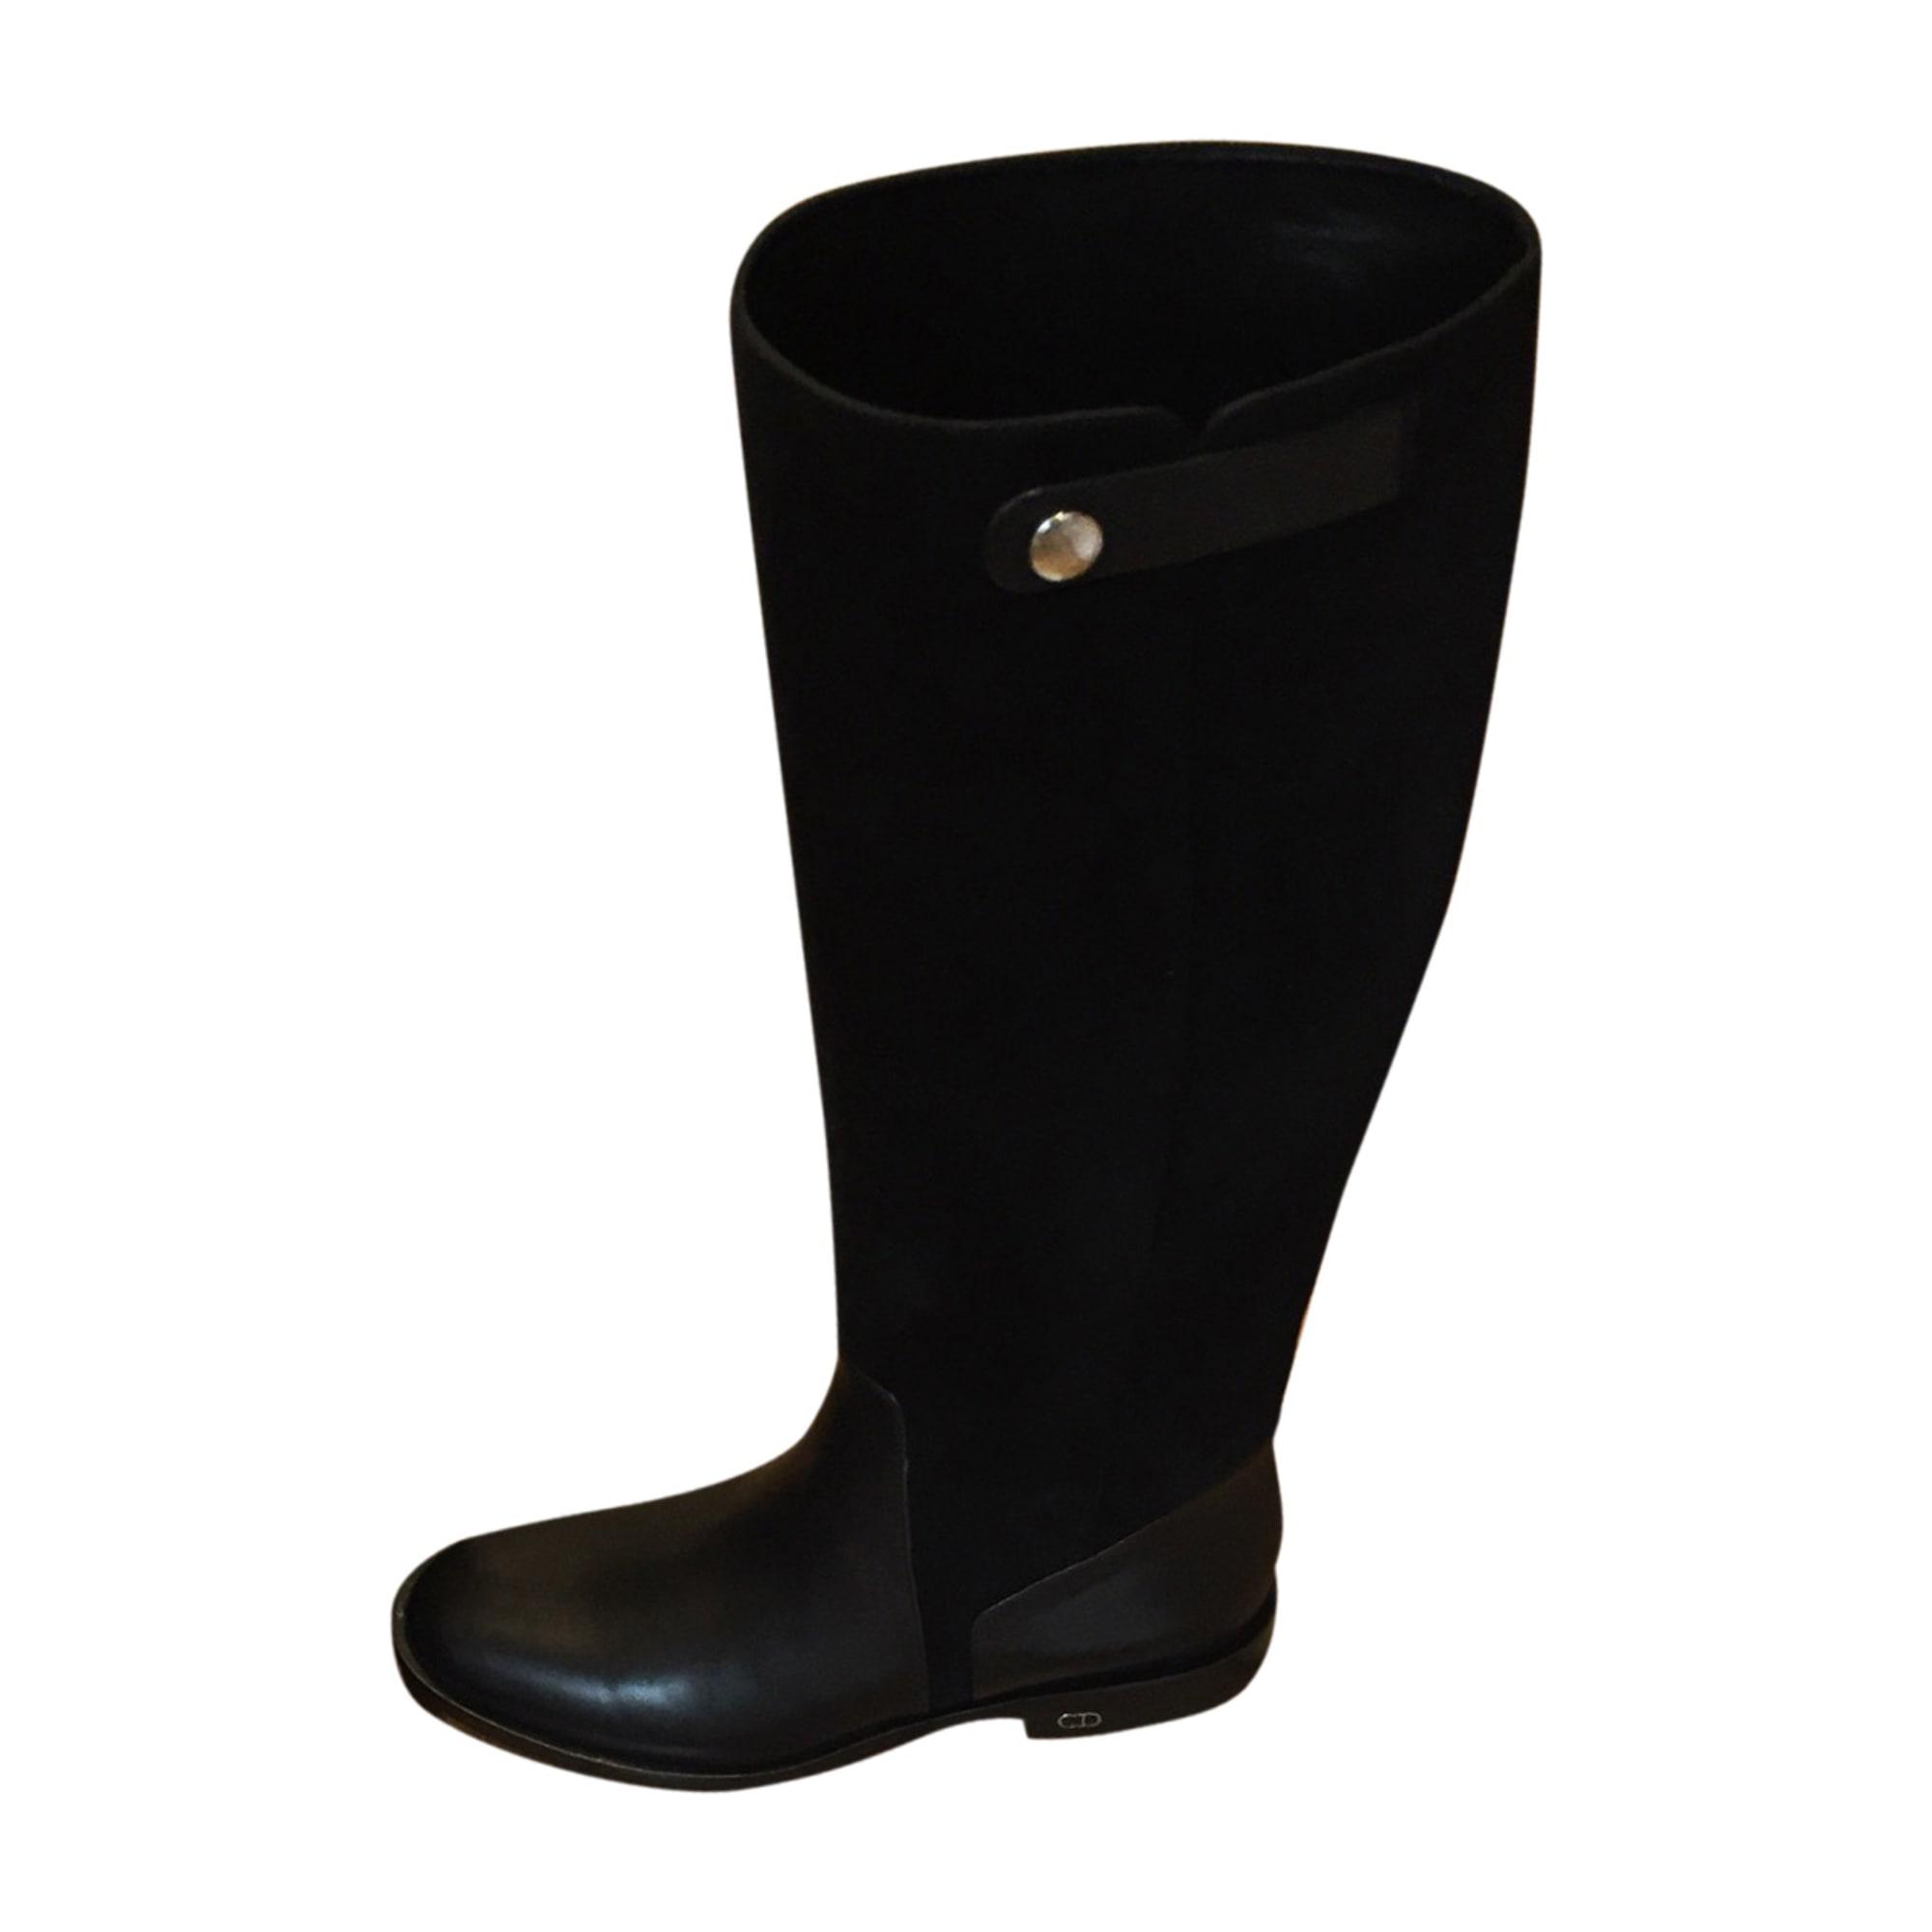 Bottes cavalières DIOR 37 noir vendu par Christiandupont - 7737139 96fe7a31aad